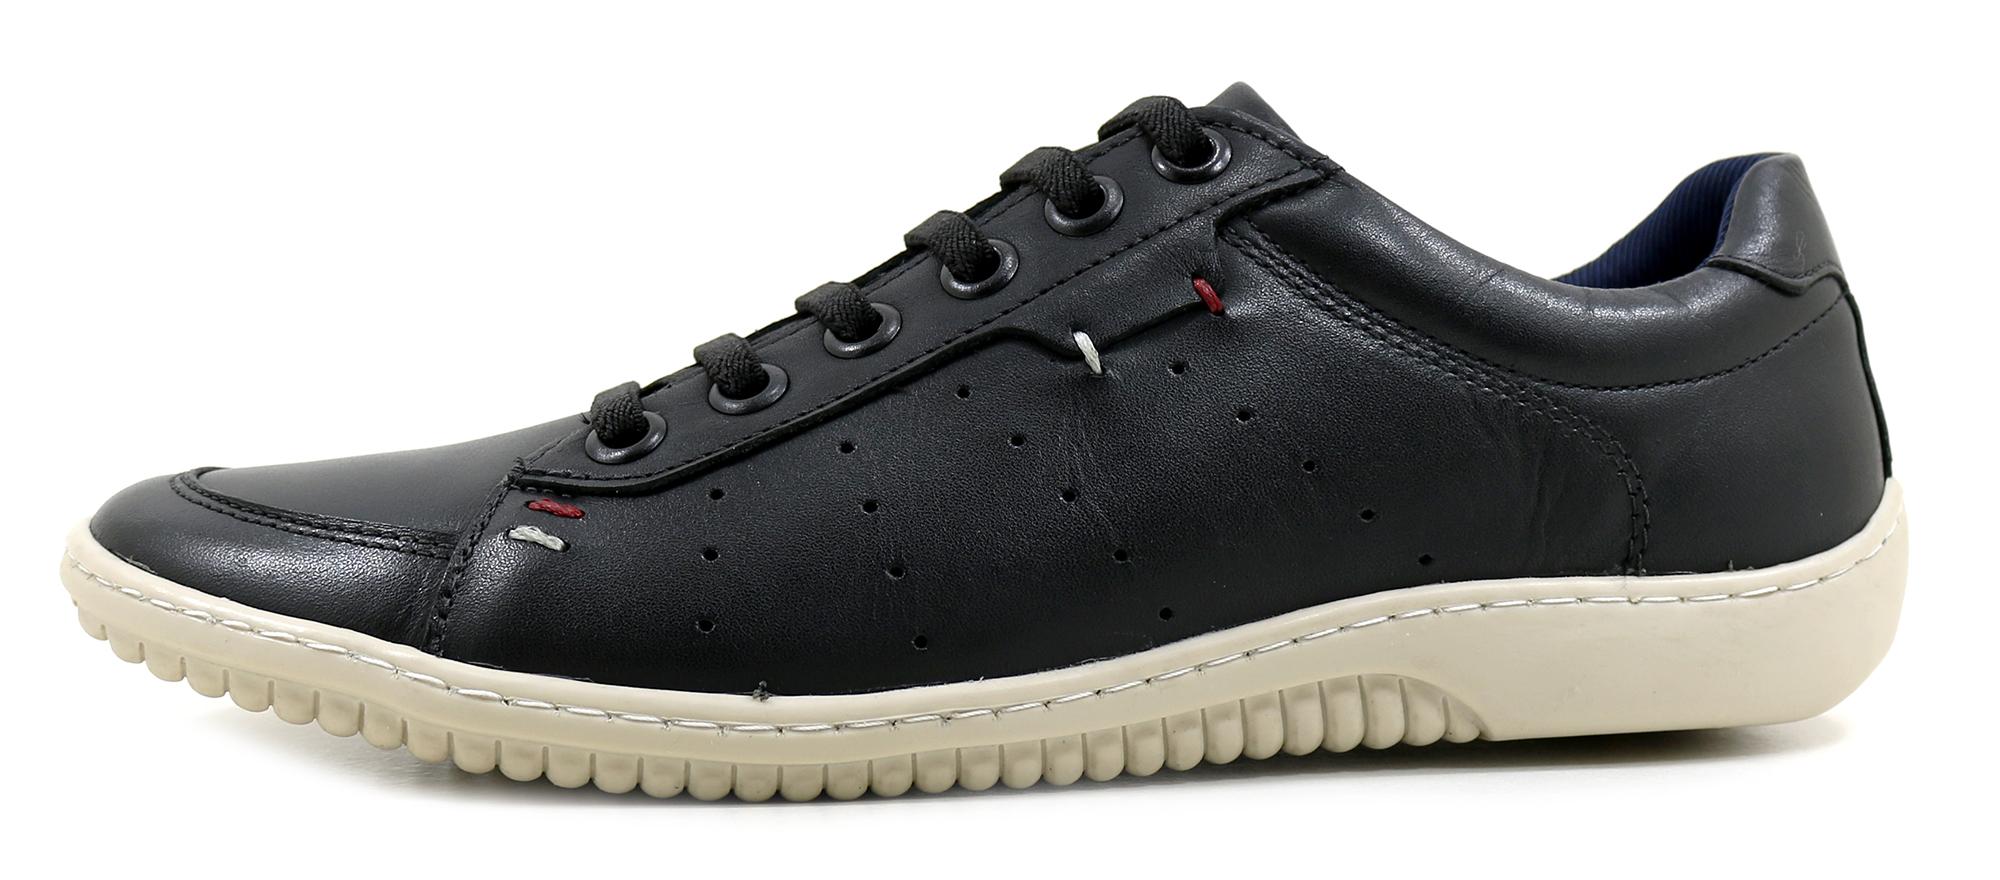 b06f003555 Sapatênis Crook Preto - Loja Orlandelli Calçados - Sapatos Masculinos